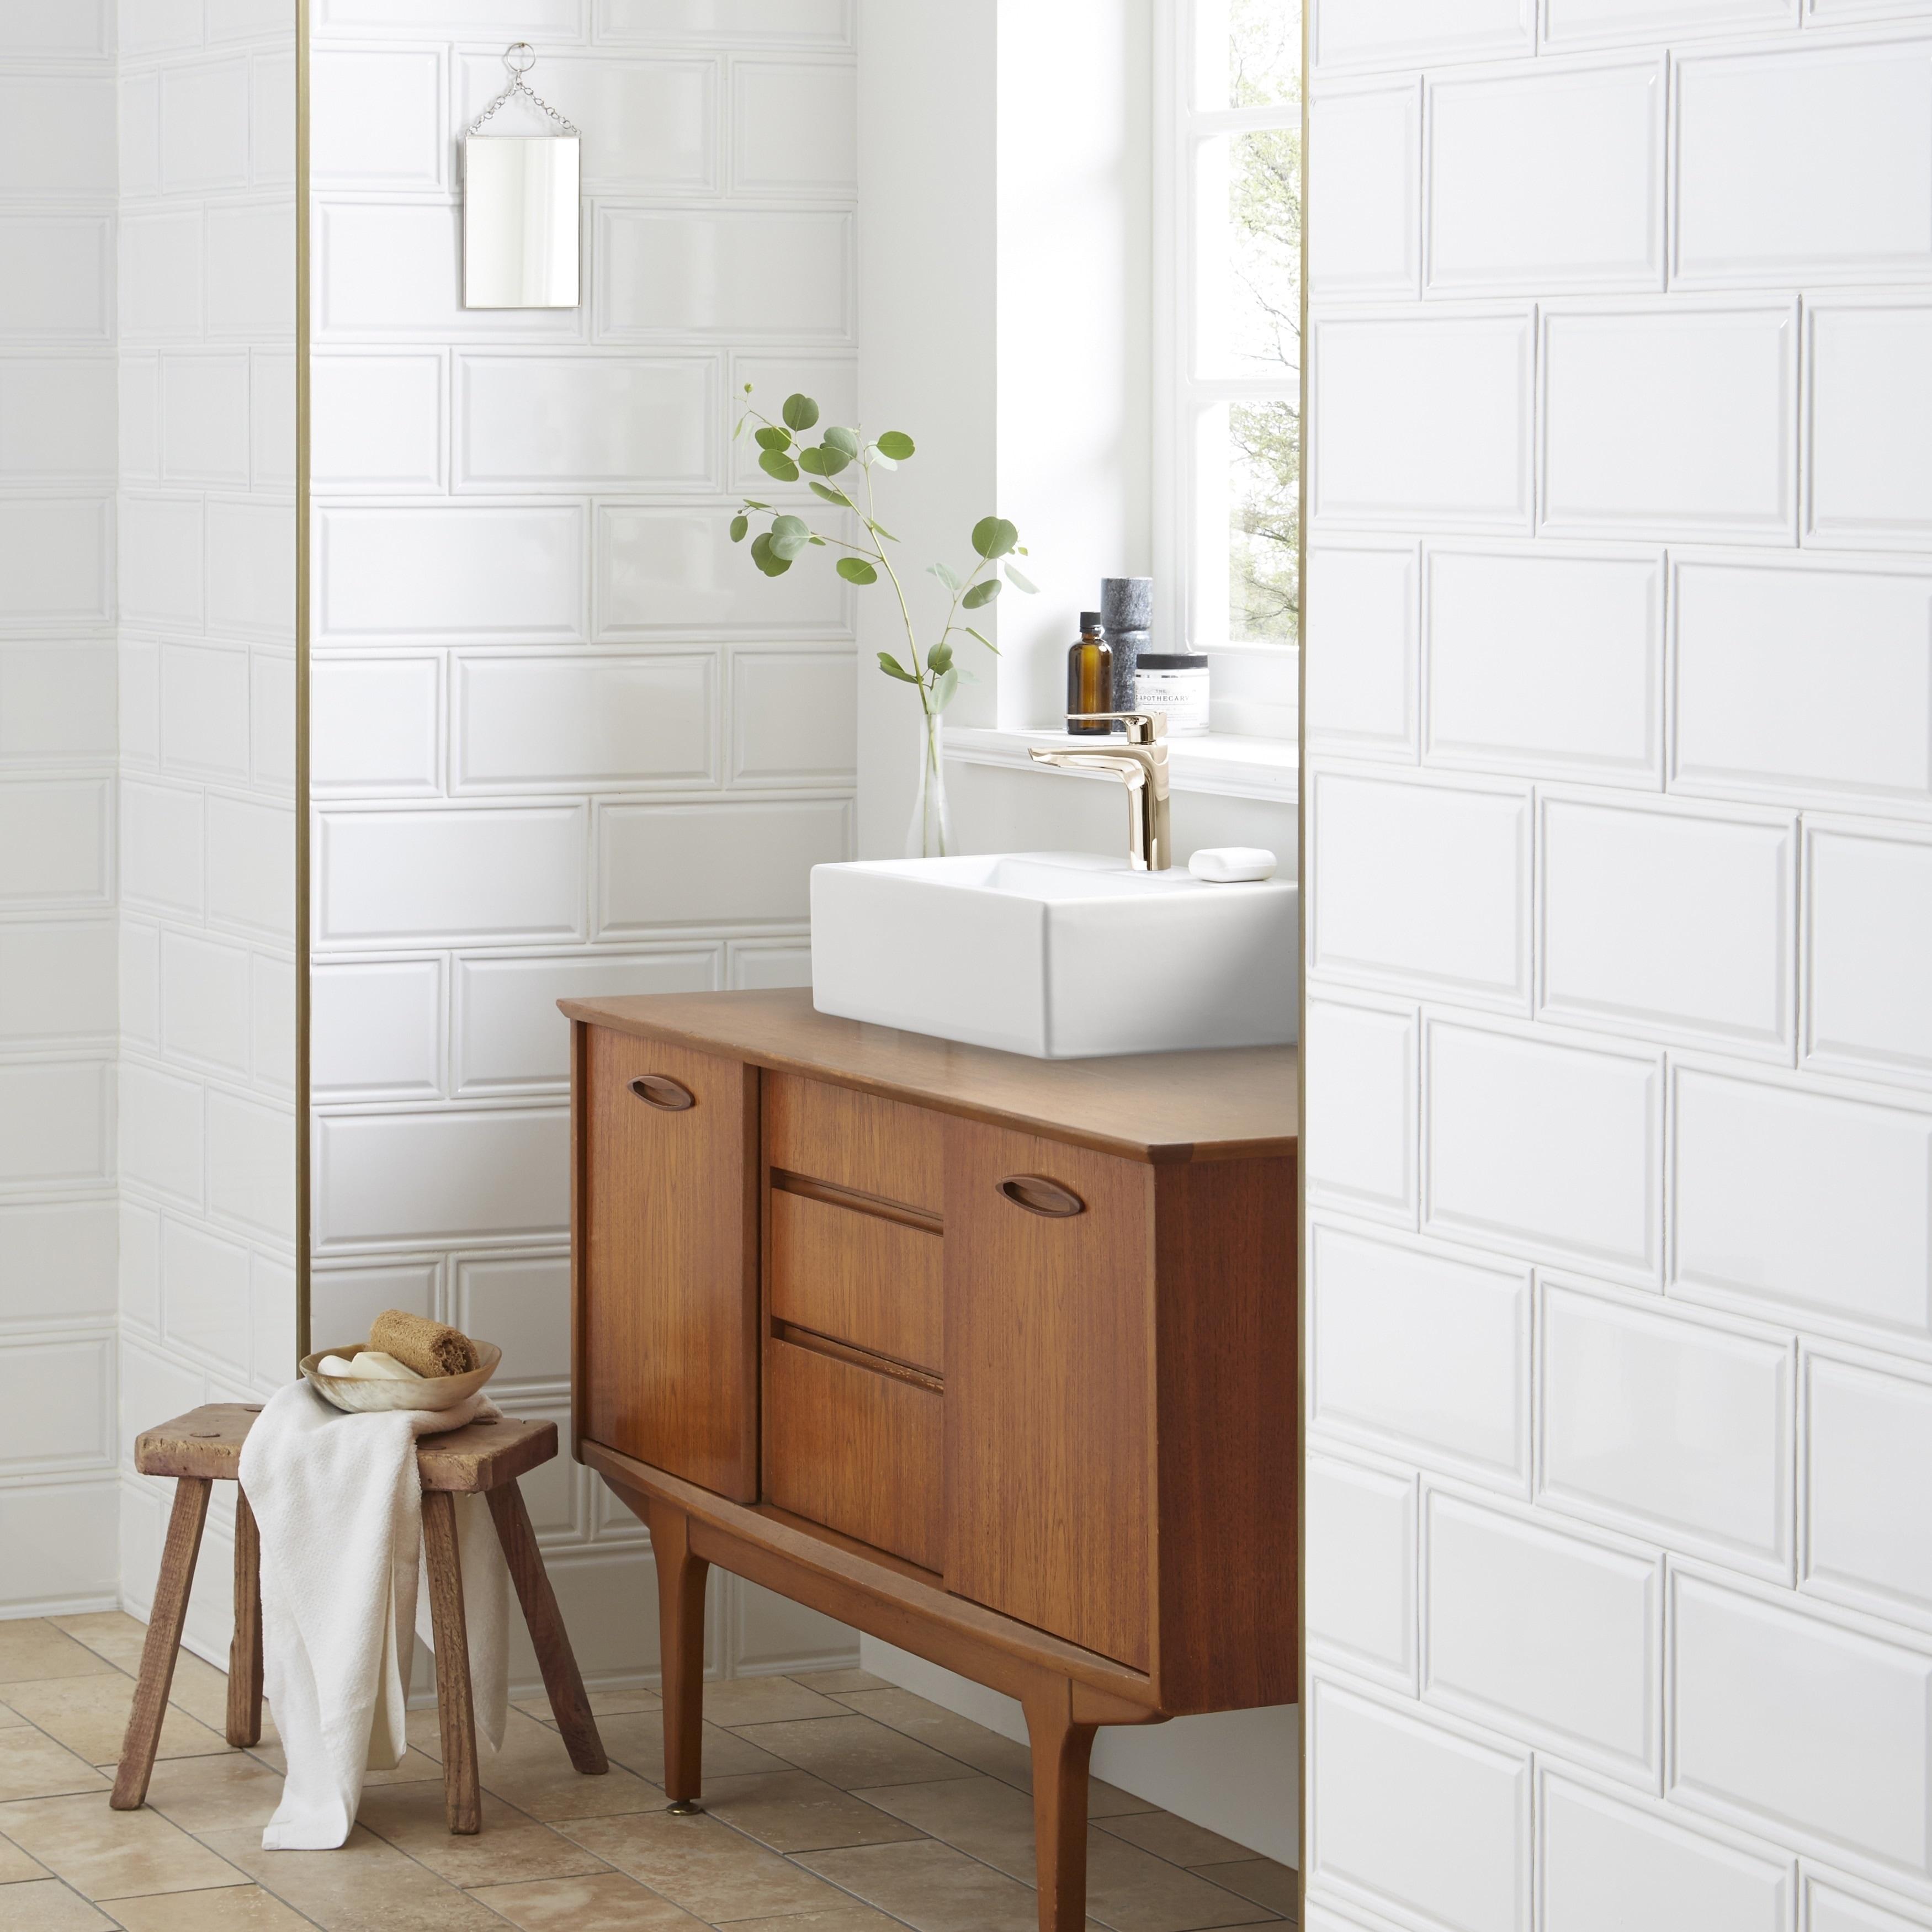 Shop SomerTile 6x12-inch Dobladillo White Ceramic Wall Tile (22 ...